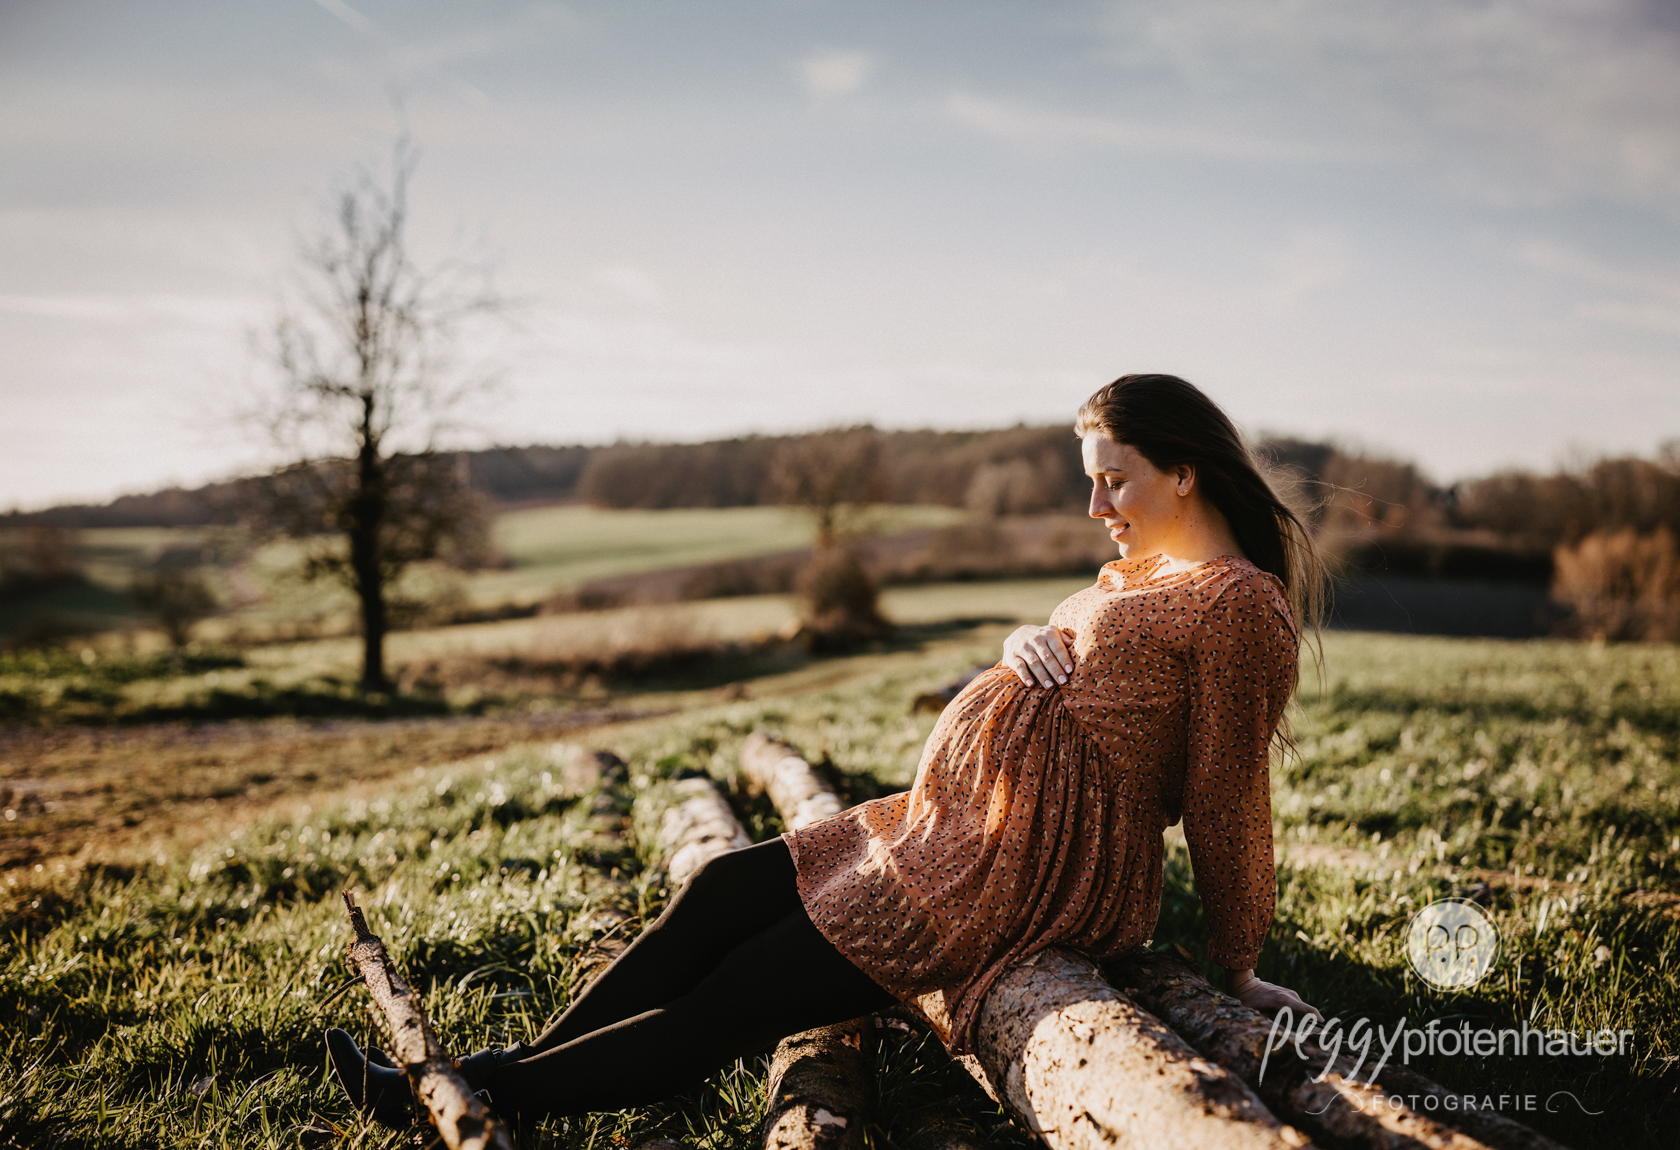 Schwangerschaftsbilder outdoor